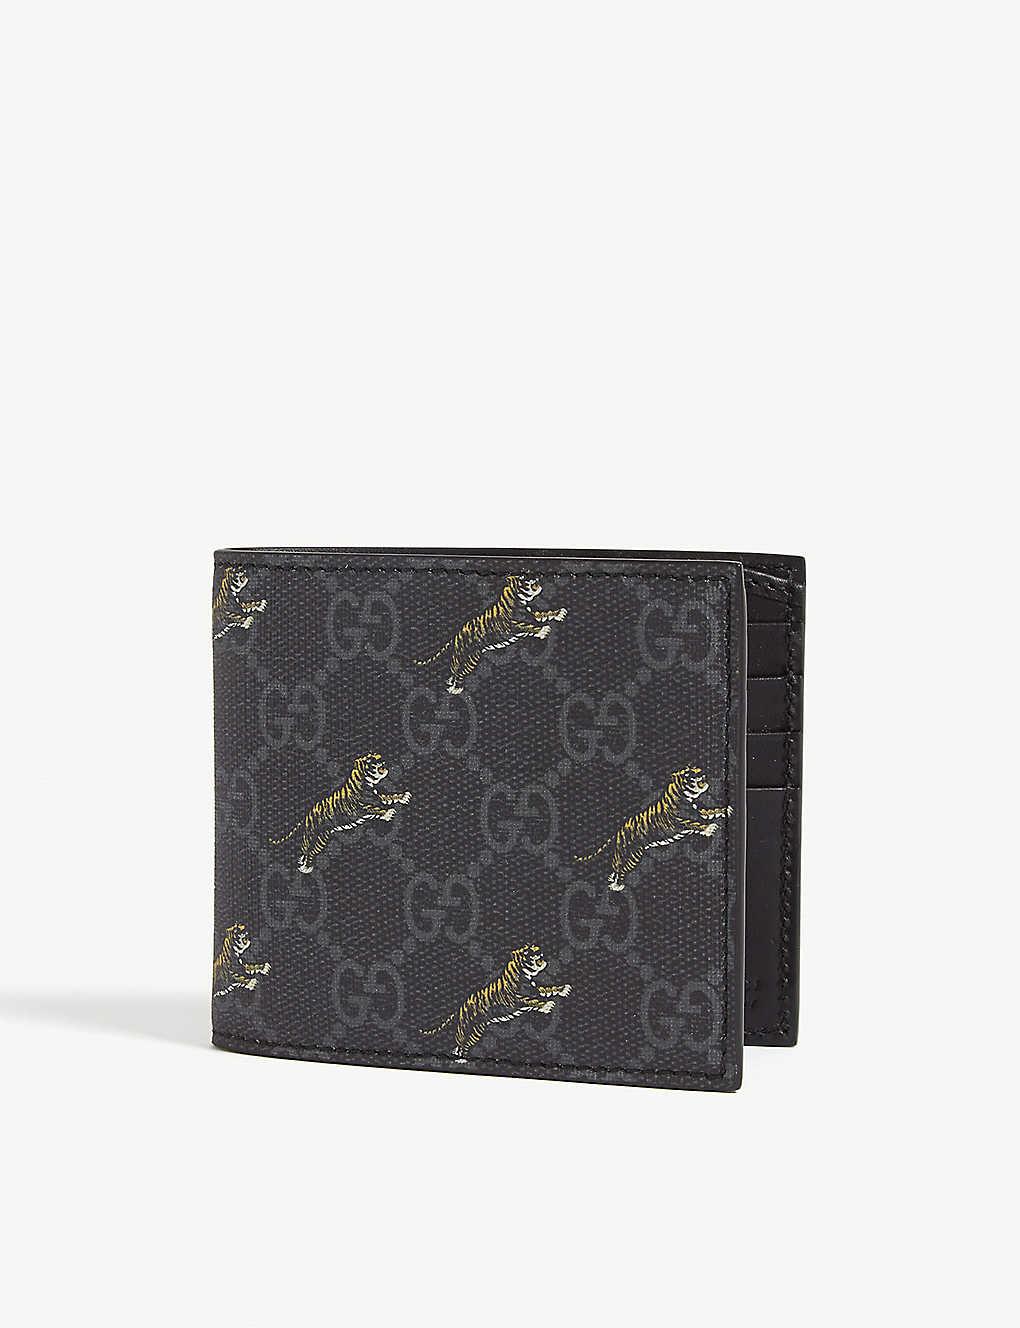 1ff9691d GUCCI - GG Supreme tigers coated canvas bifold wallet | Selfridges.com